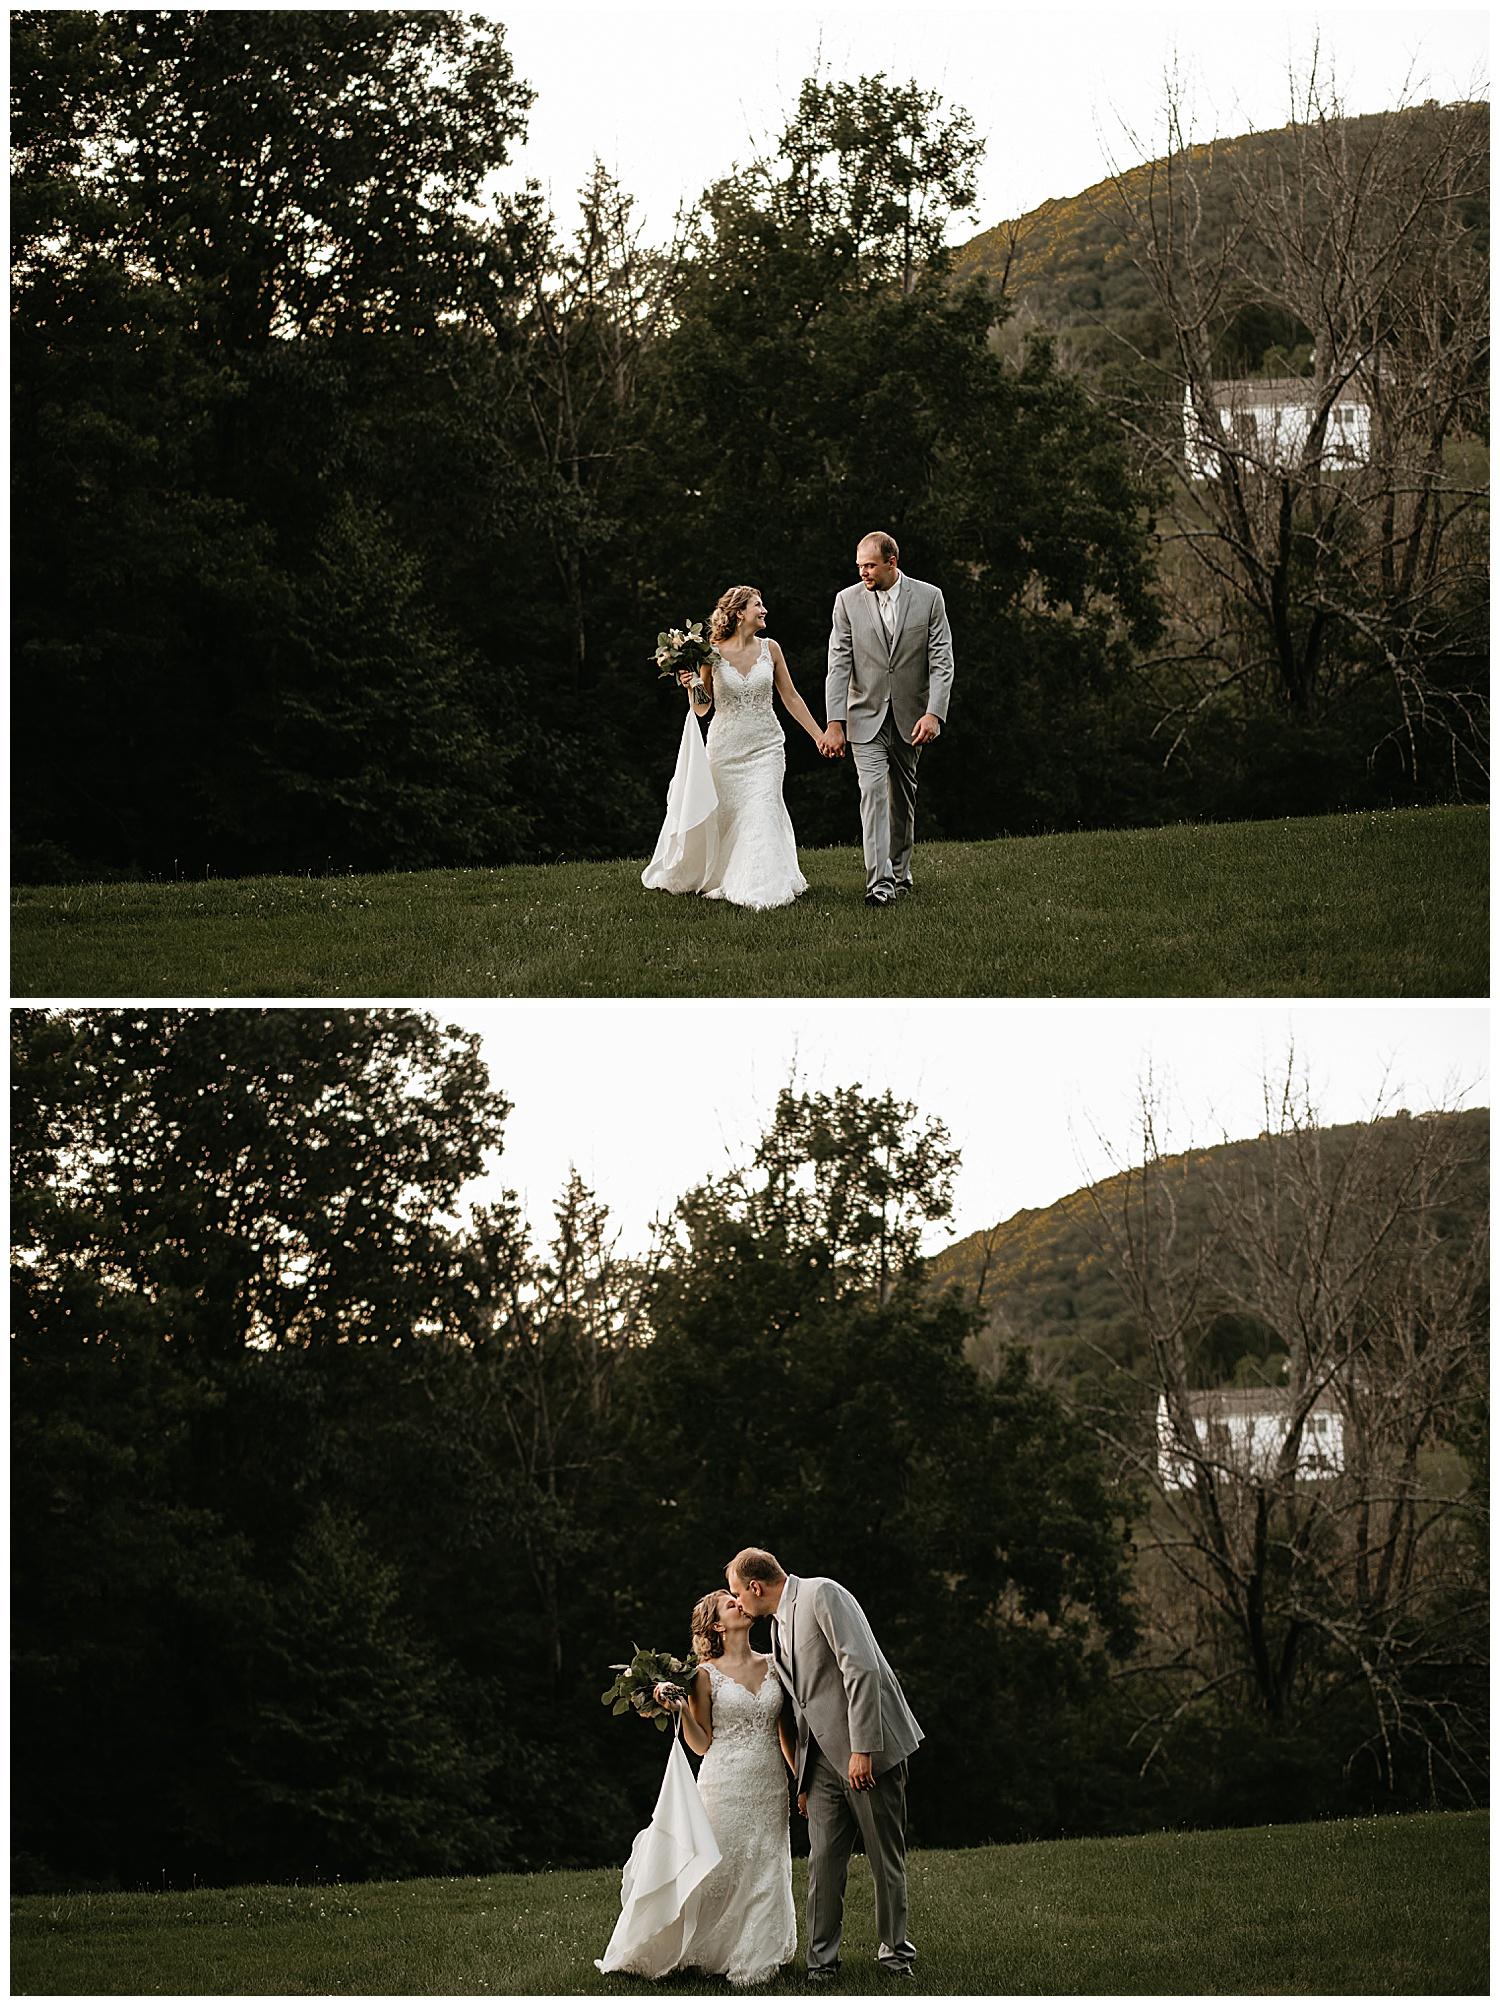 NEPA-Lehigh-Valley-Wedding-Photographer-at-Fountain-Springs-Country-Inn-Ashland-PA_0068.jpg